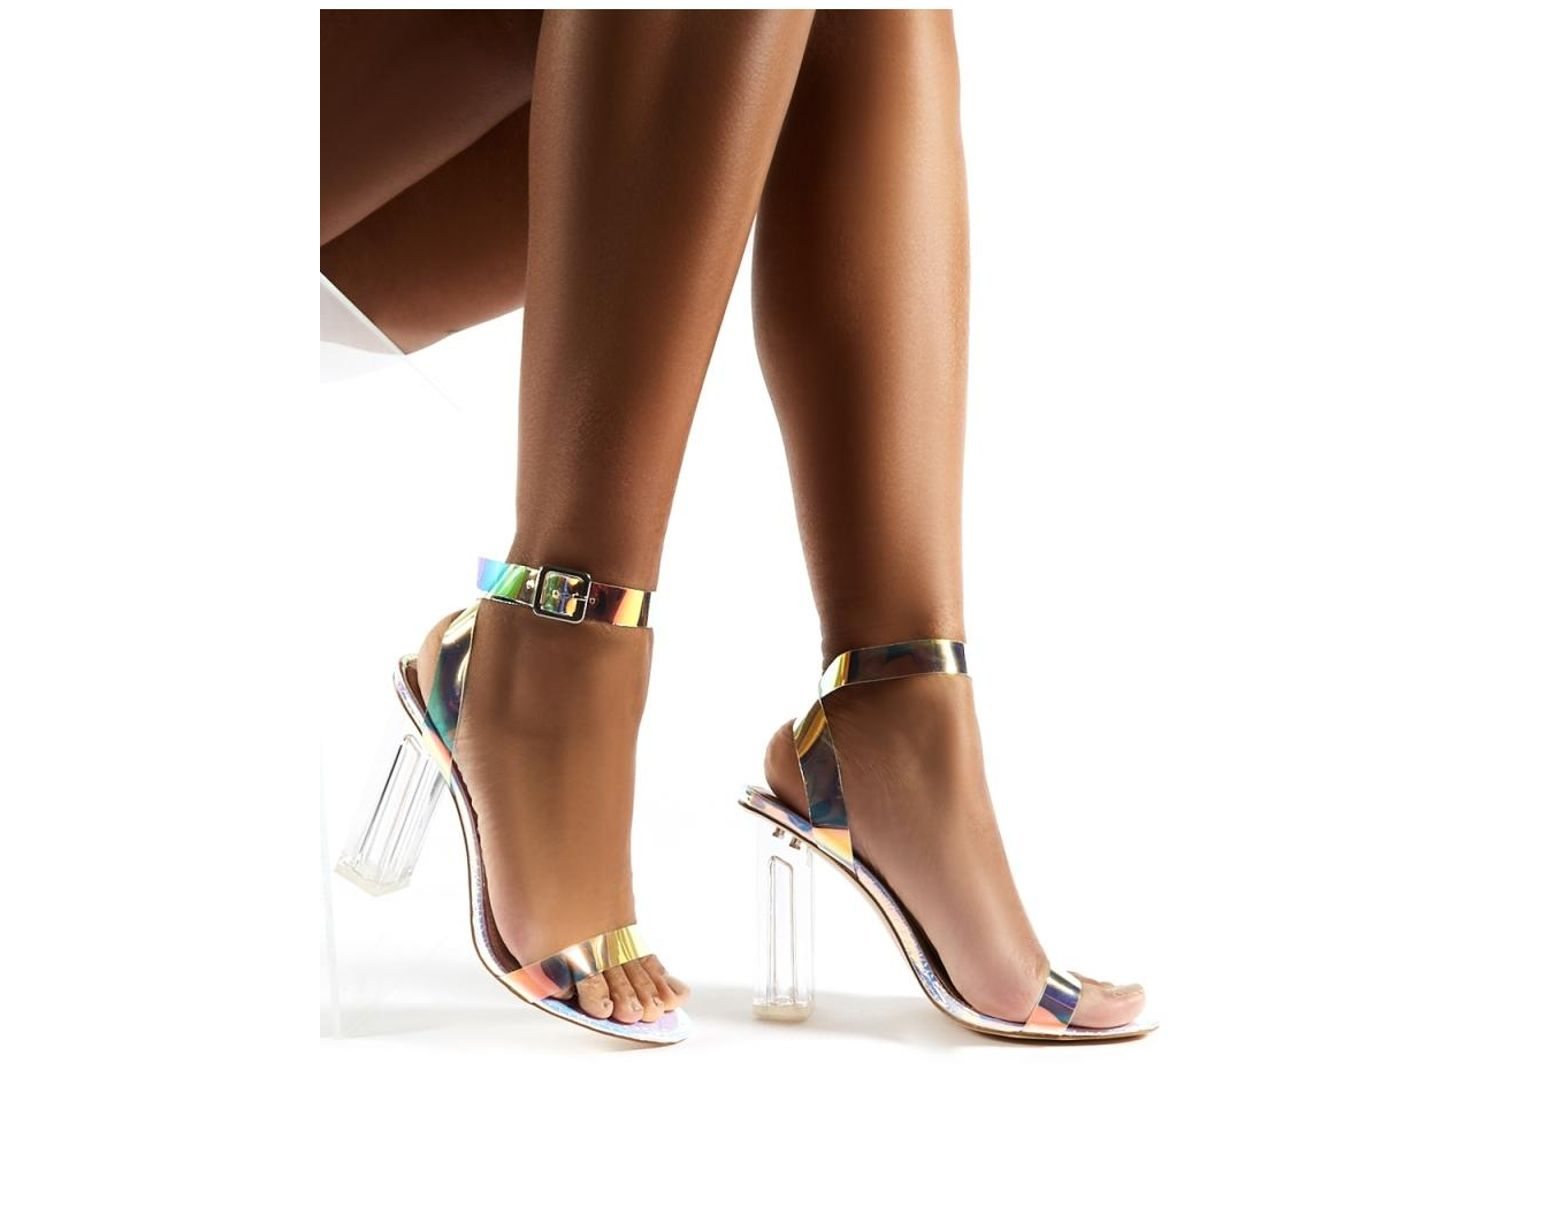 2d34b2ed78d Women's Alia Strappy Perspex High Heels In Iridescent